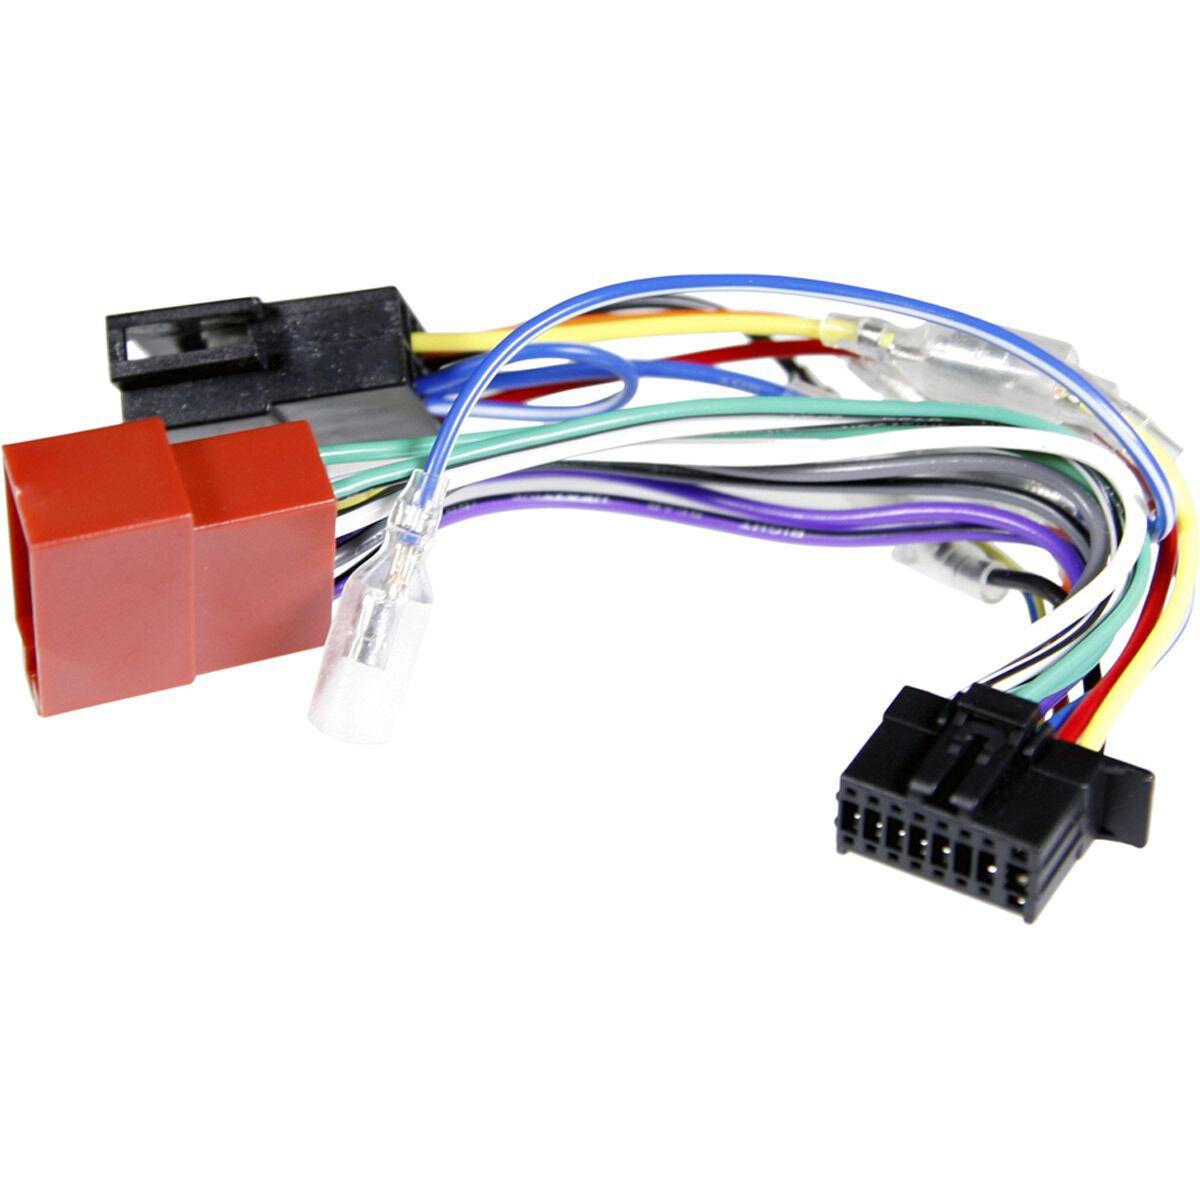 aerpro wiring harness suit jvc head units app8jvc5 jvc to pioneer wiring harness jvc wiring harness [ 1200 x 1200 Pixel ]